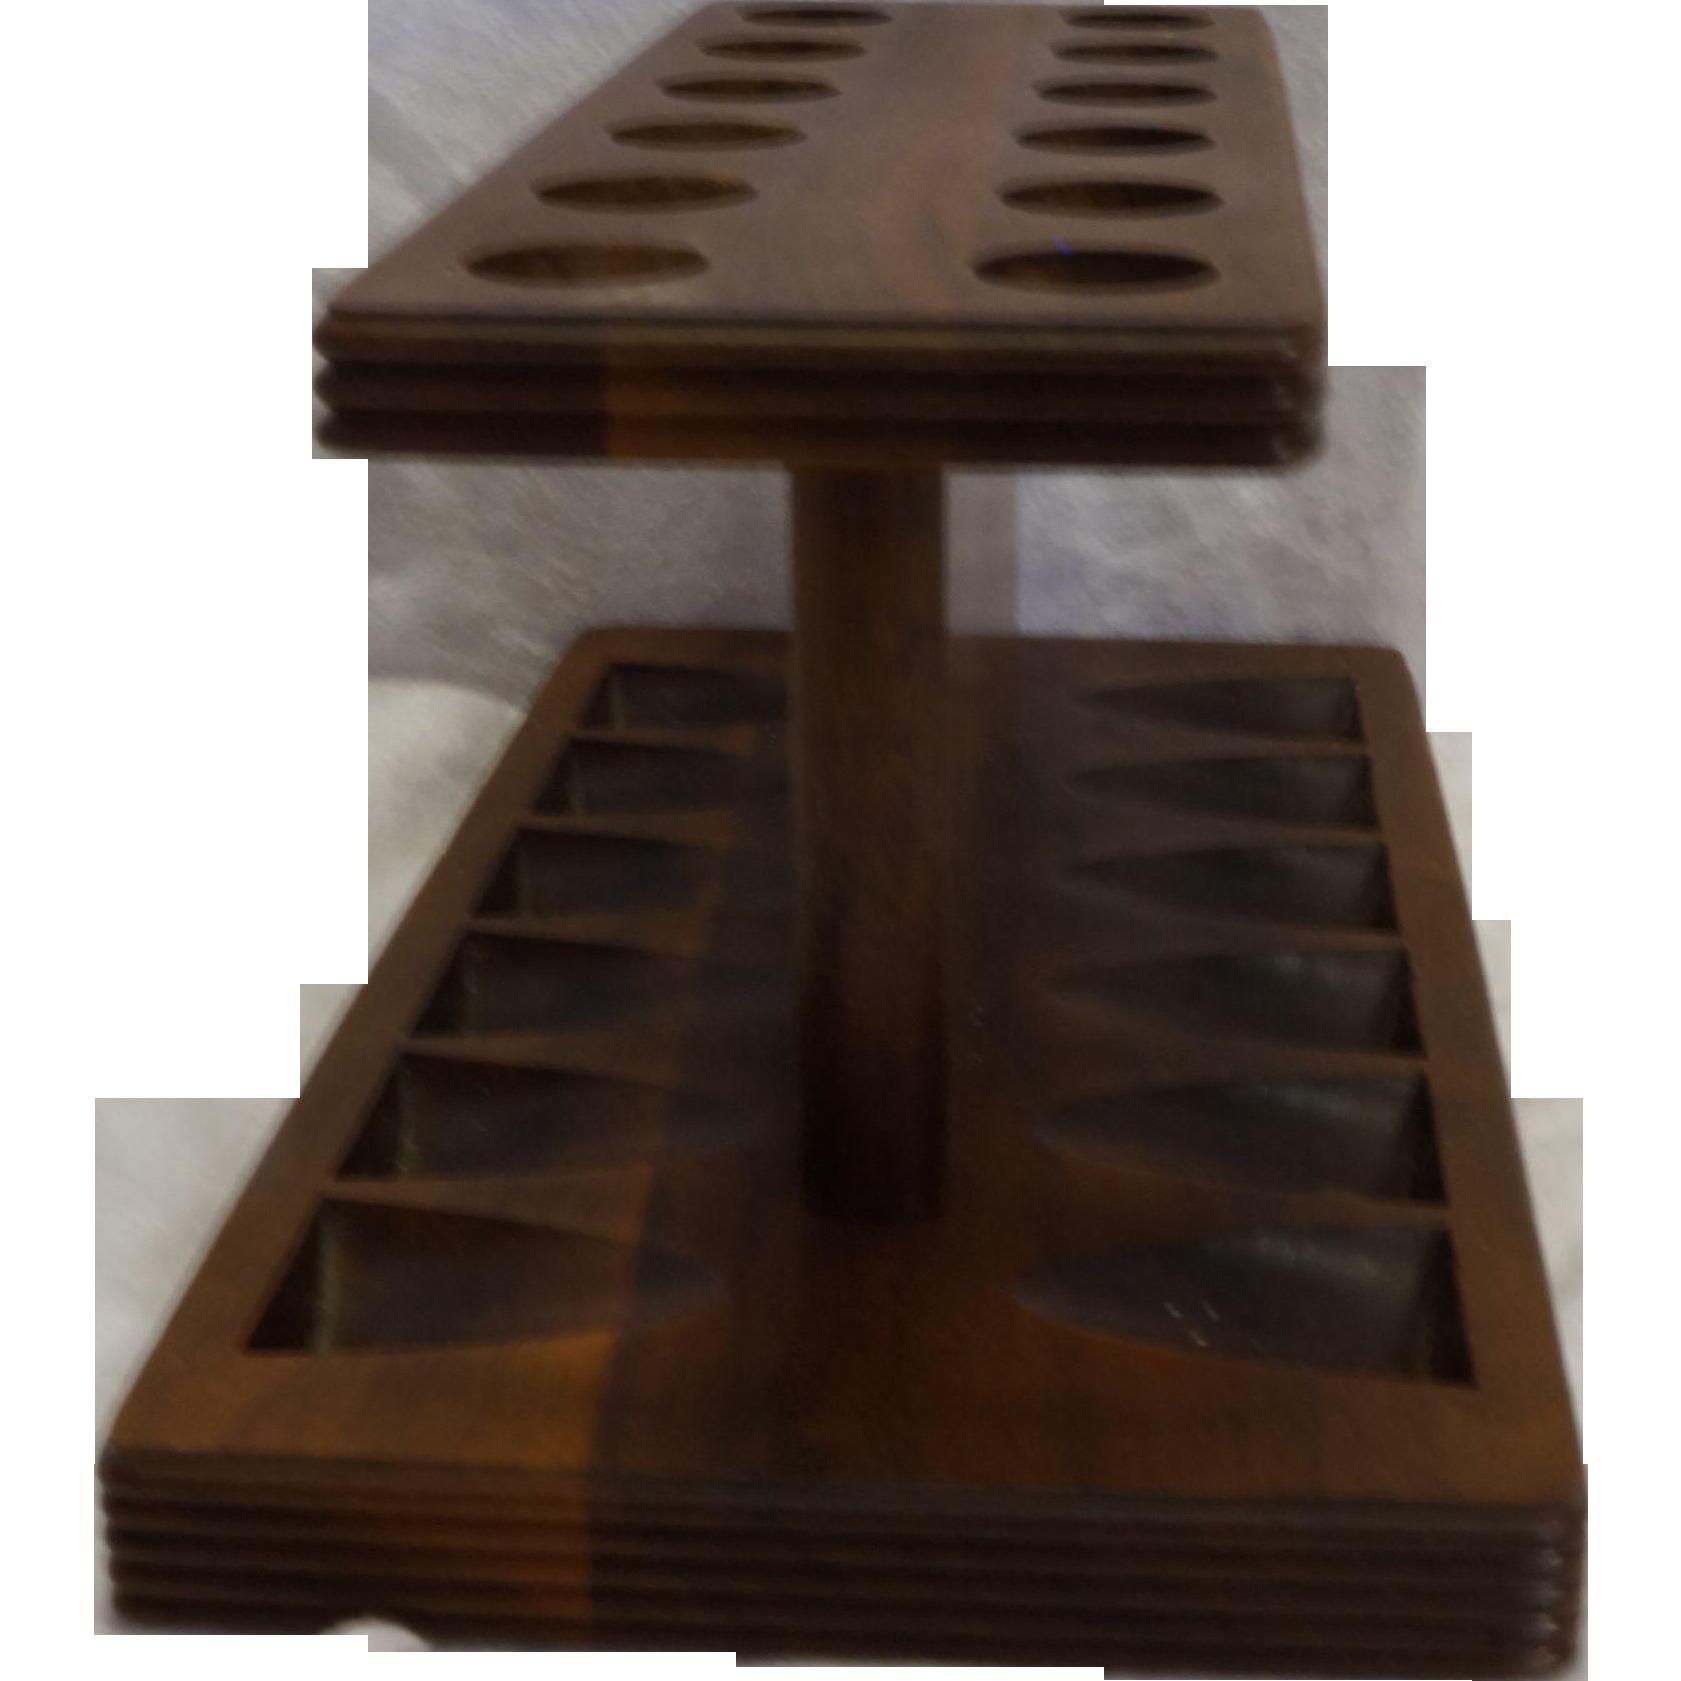 Decatur Industries Walnut Hardwood Pipe Rack Holder 12 Slot